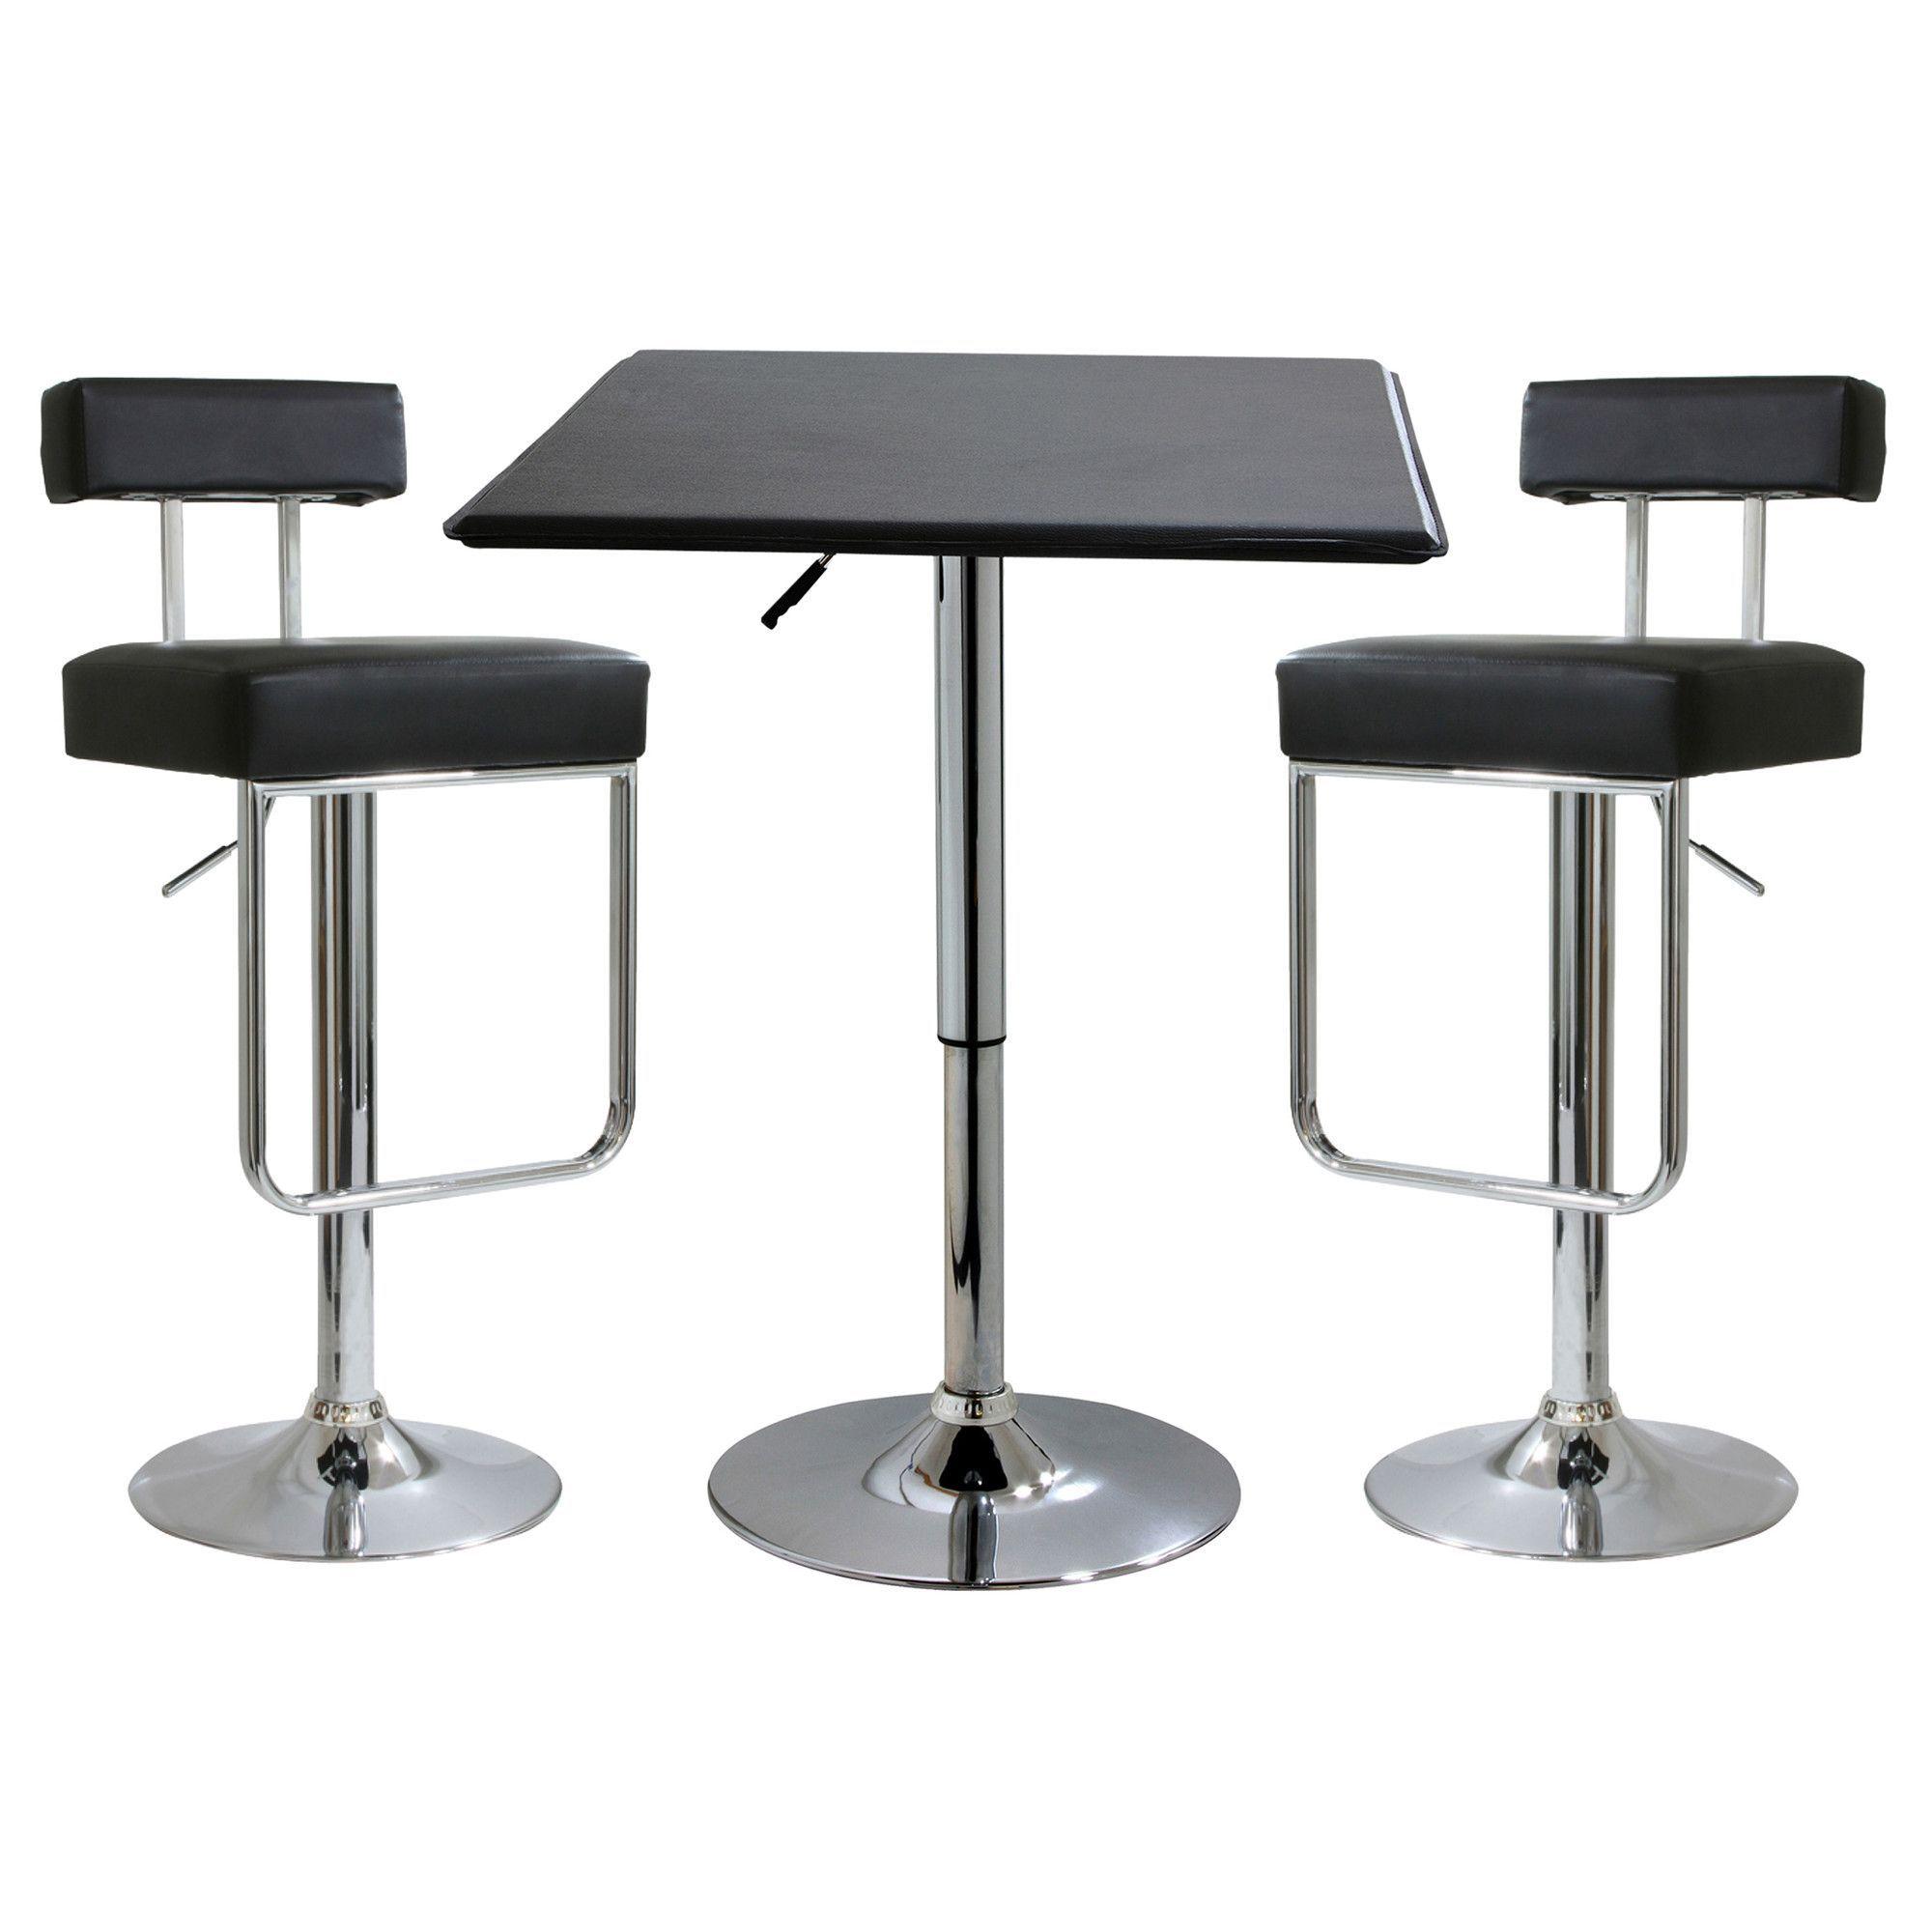 Amerihome 3 Piece Adjustable Height Pub Table Set Health And